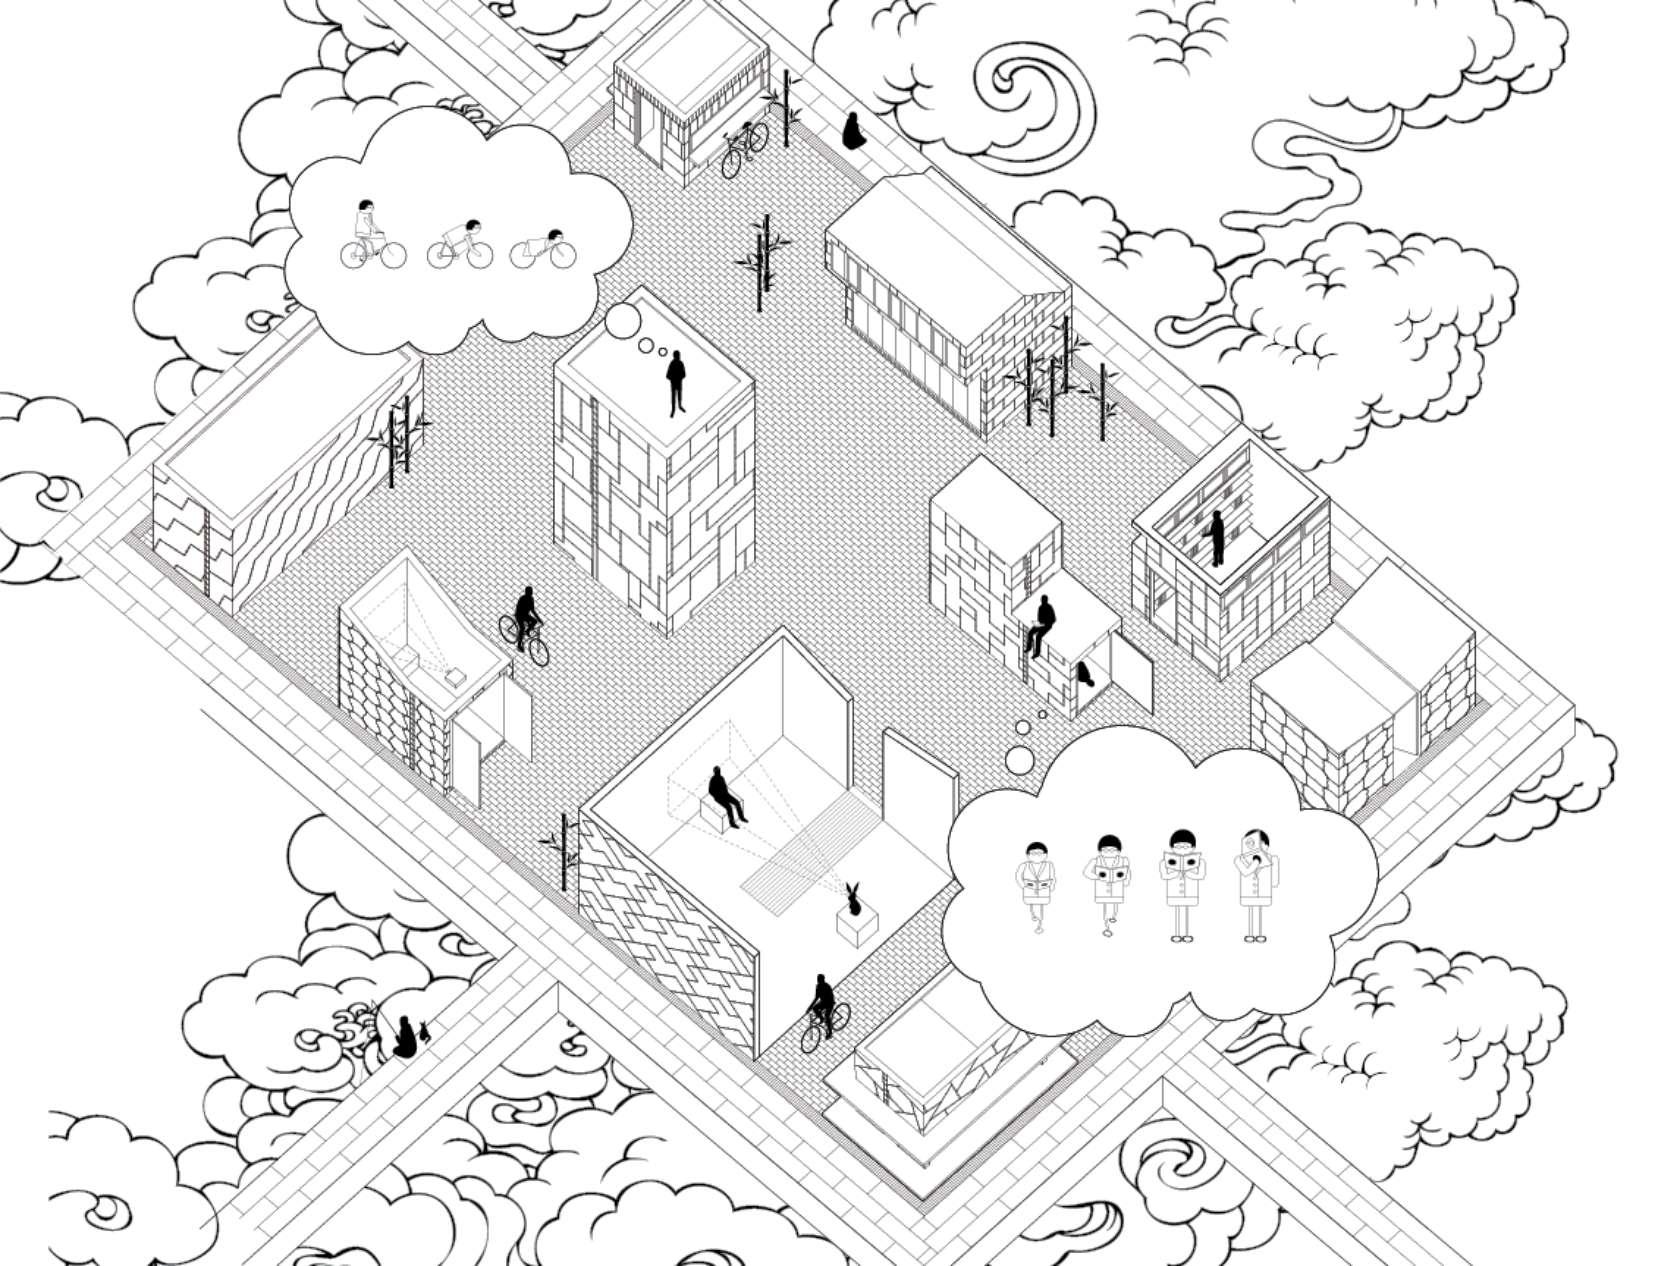 1680x1266 Architectural Illustration In A Digital Era, Drawing Isn'T Dead